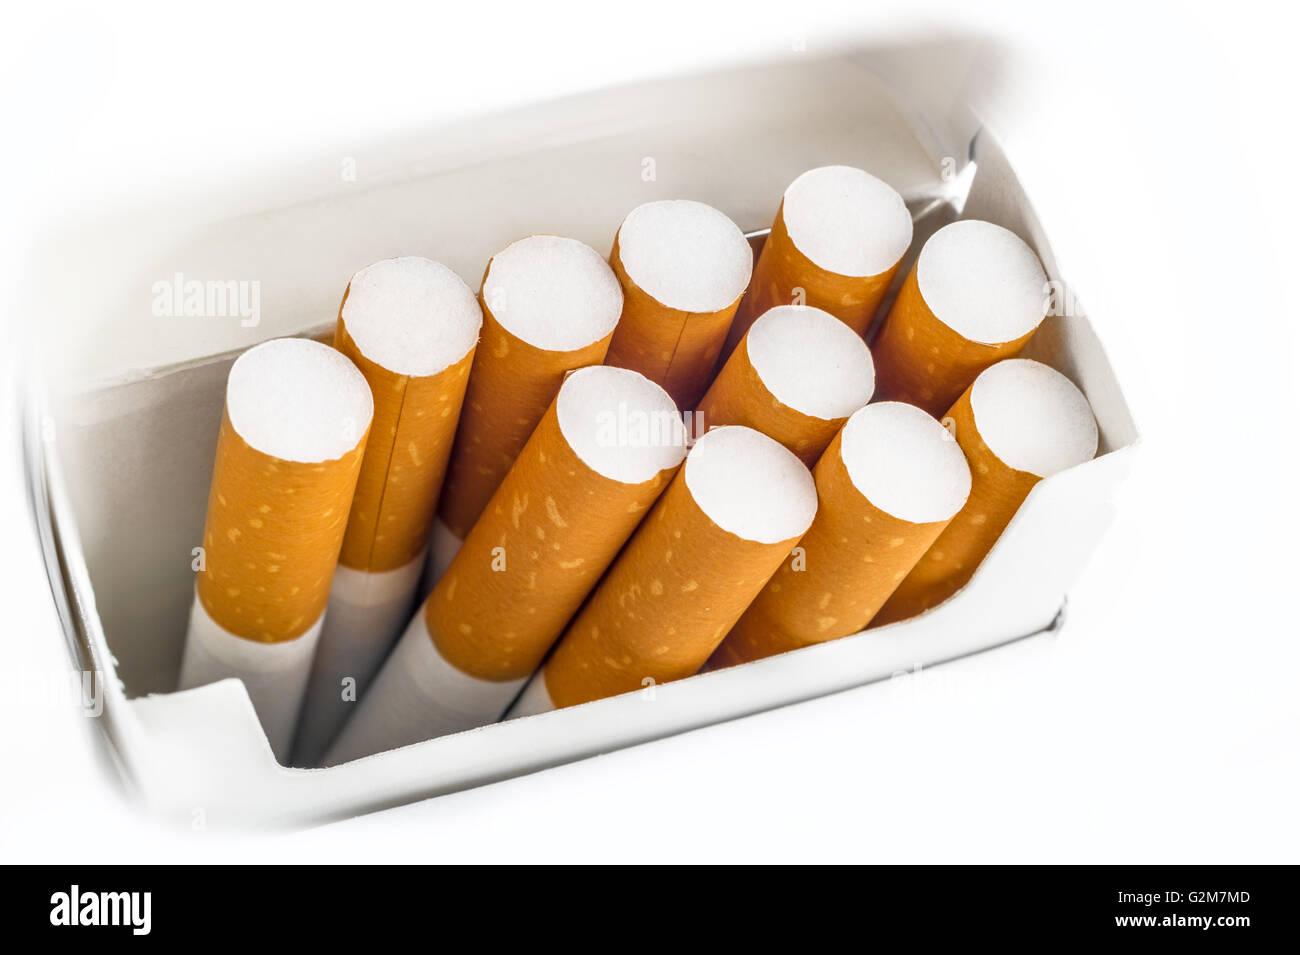 Buy cigarettes American Legend Singapore